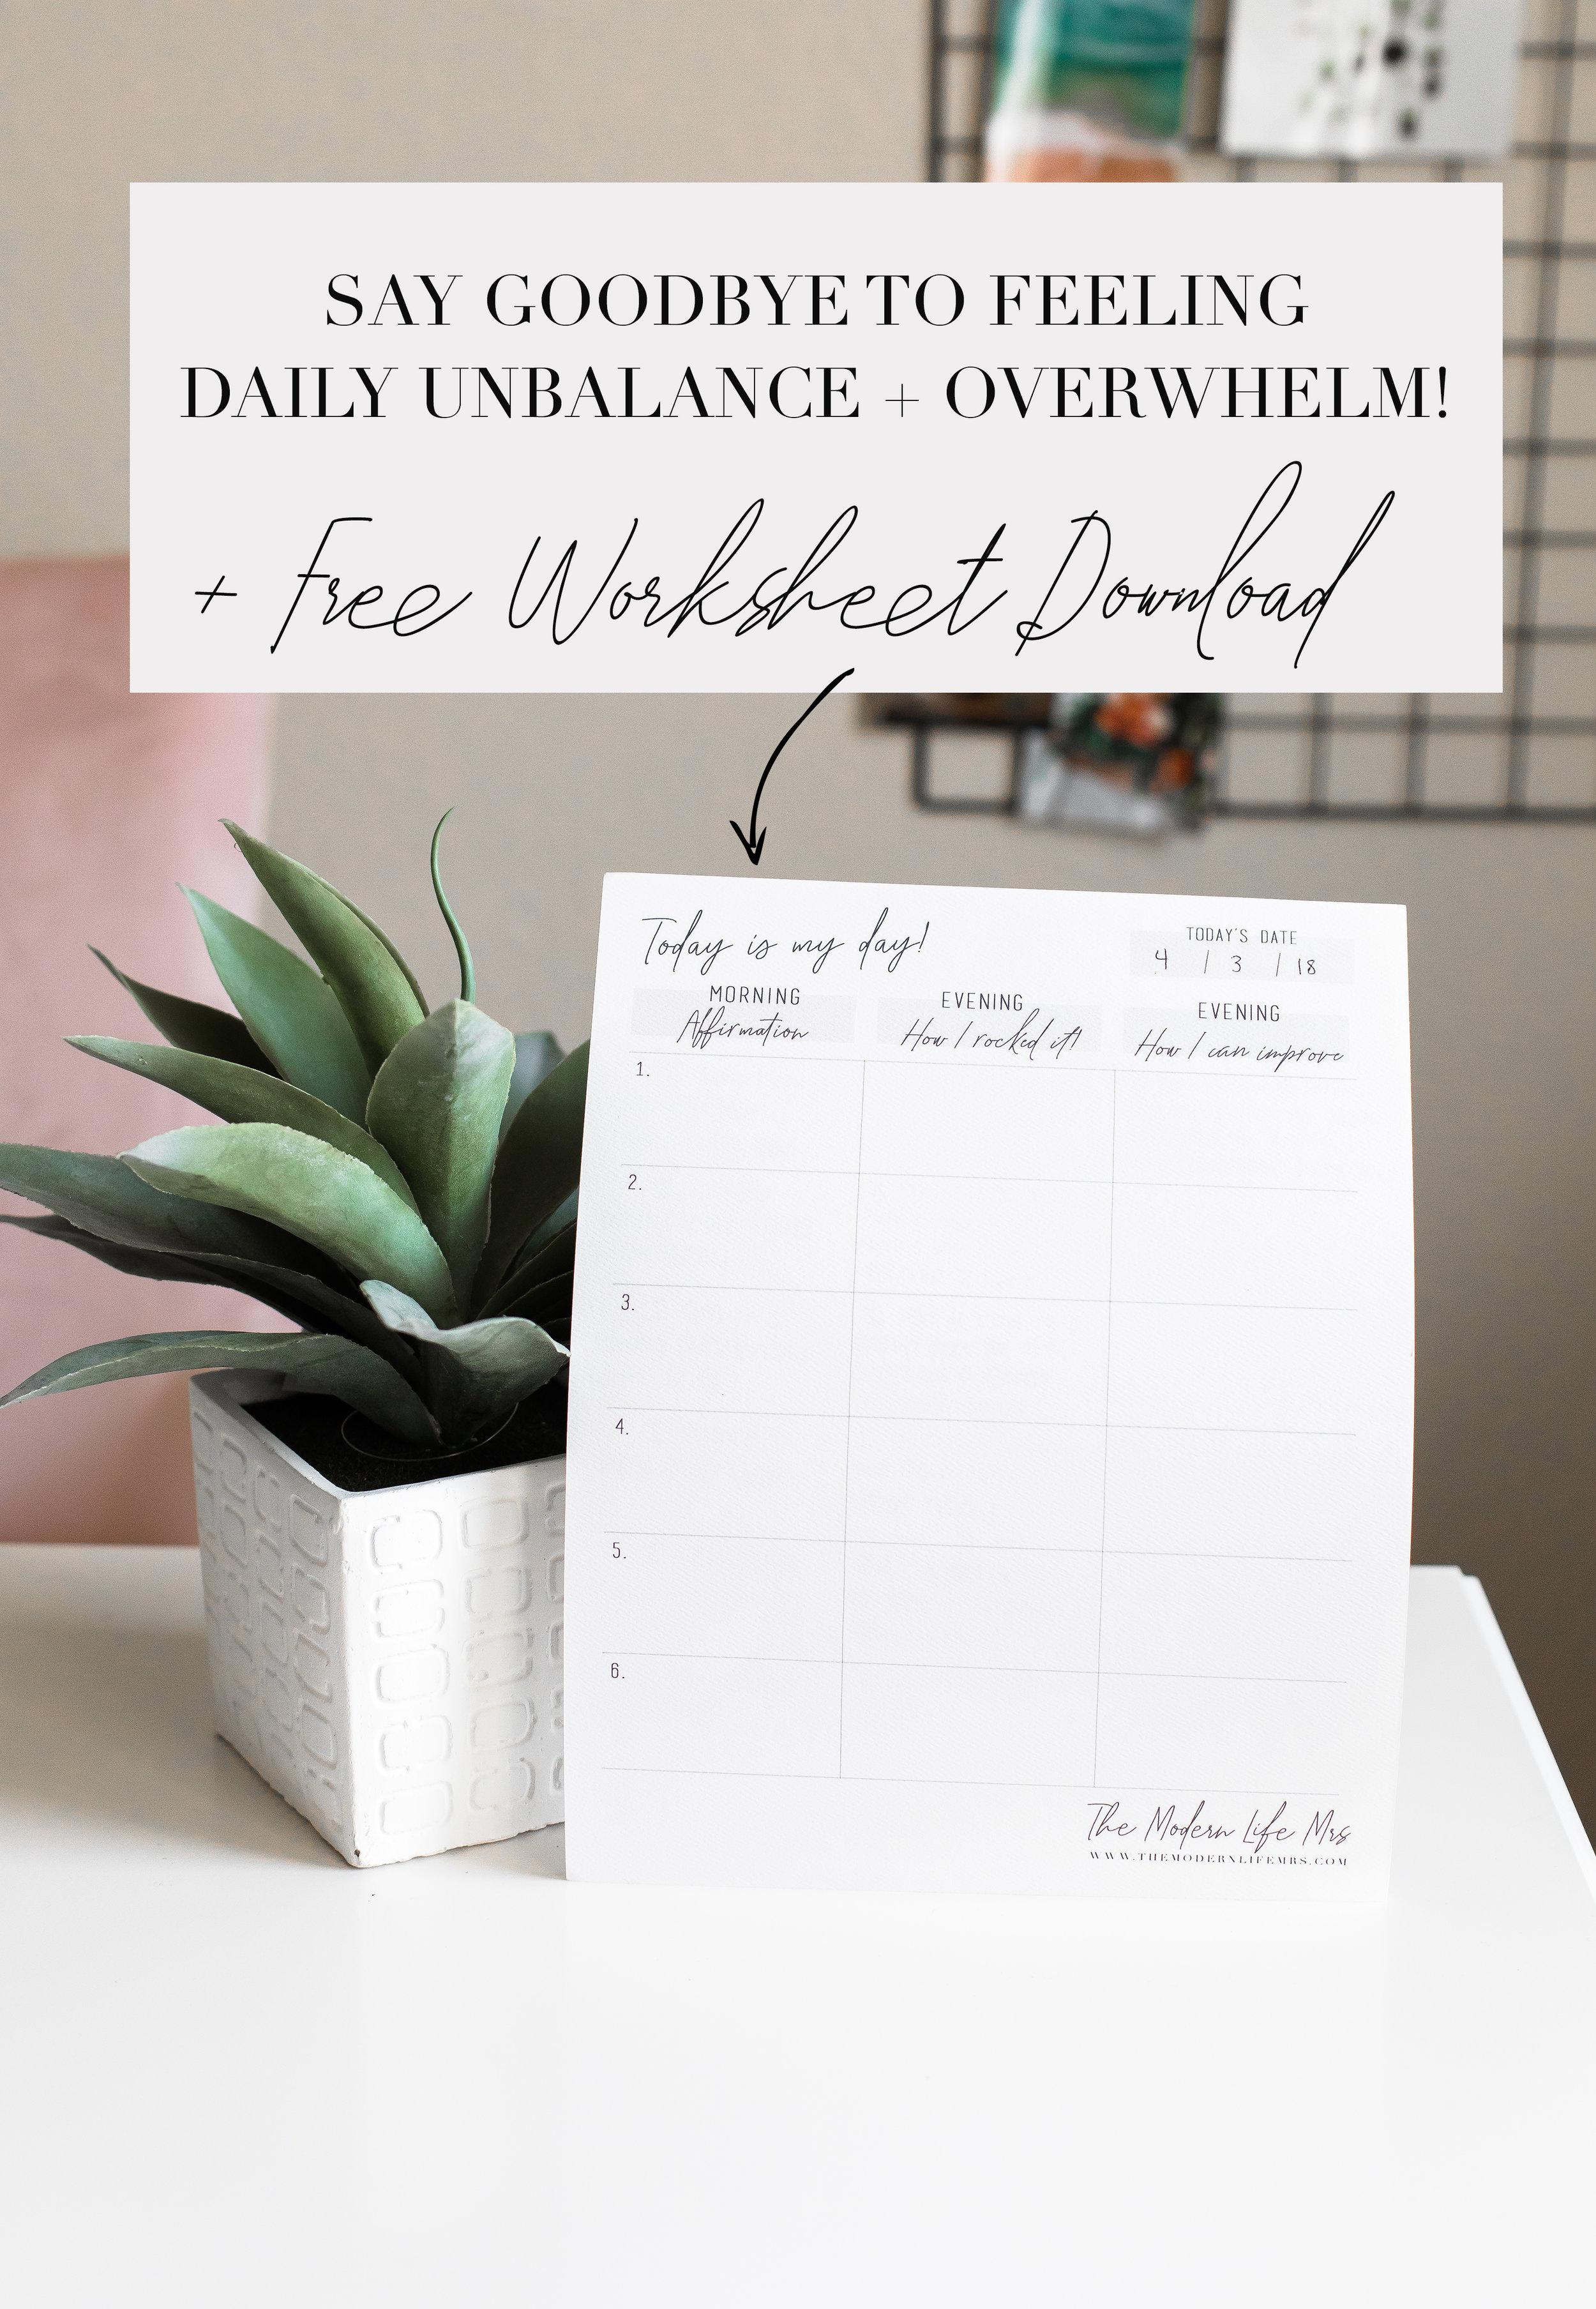 Free Worksheet Download for Finding Balance